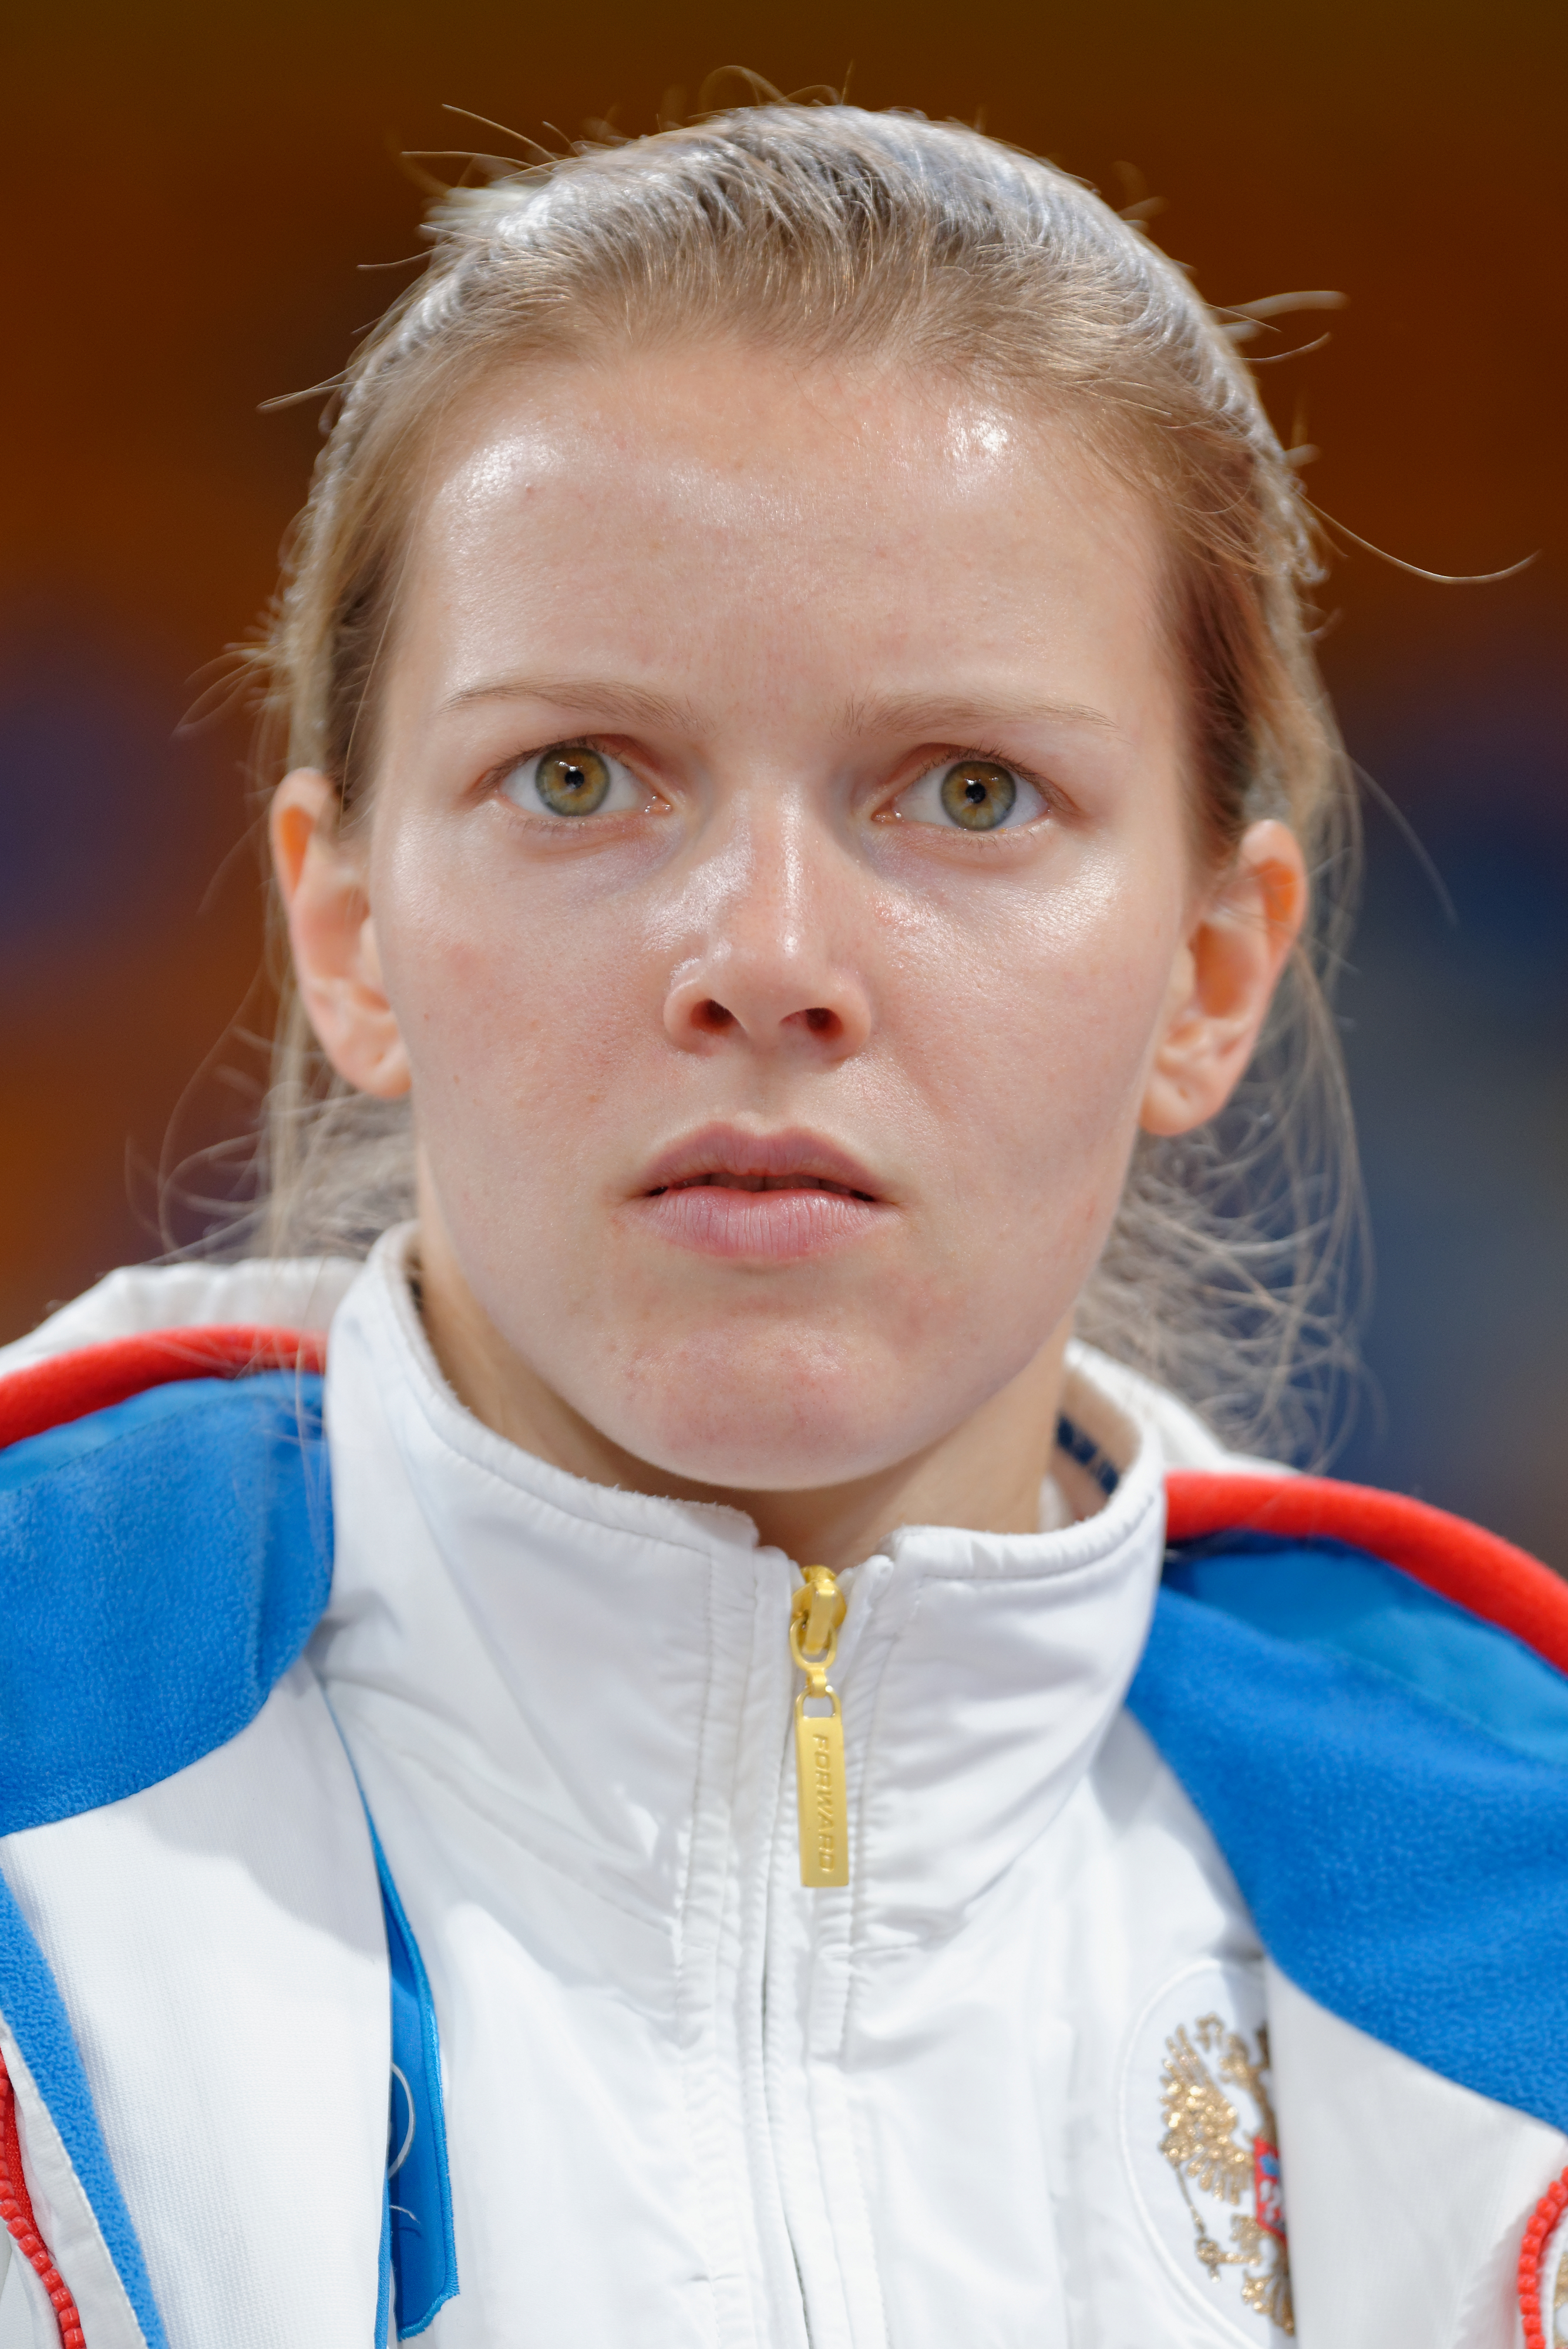 екатерина дьяченко фехтование фото